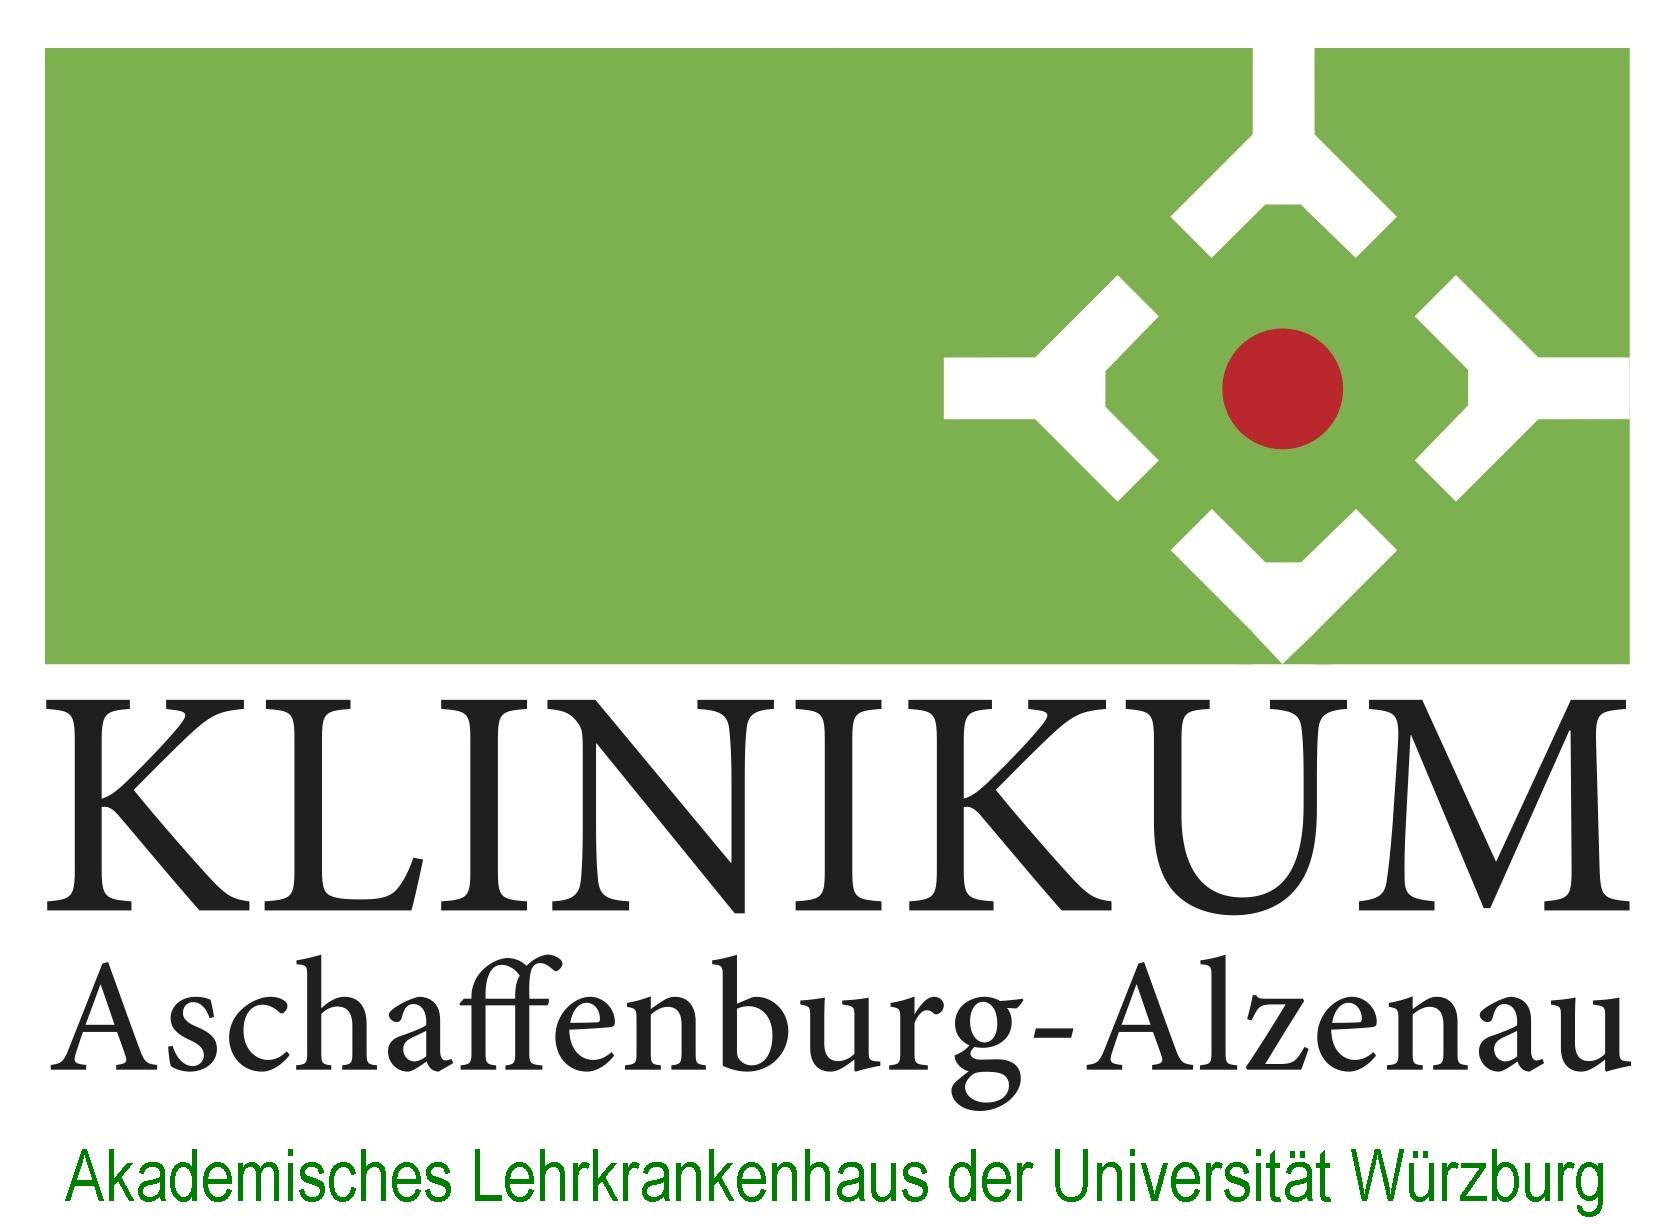 Klinikum Aschaffenburg-Alzenau